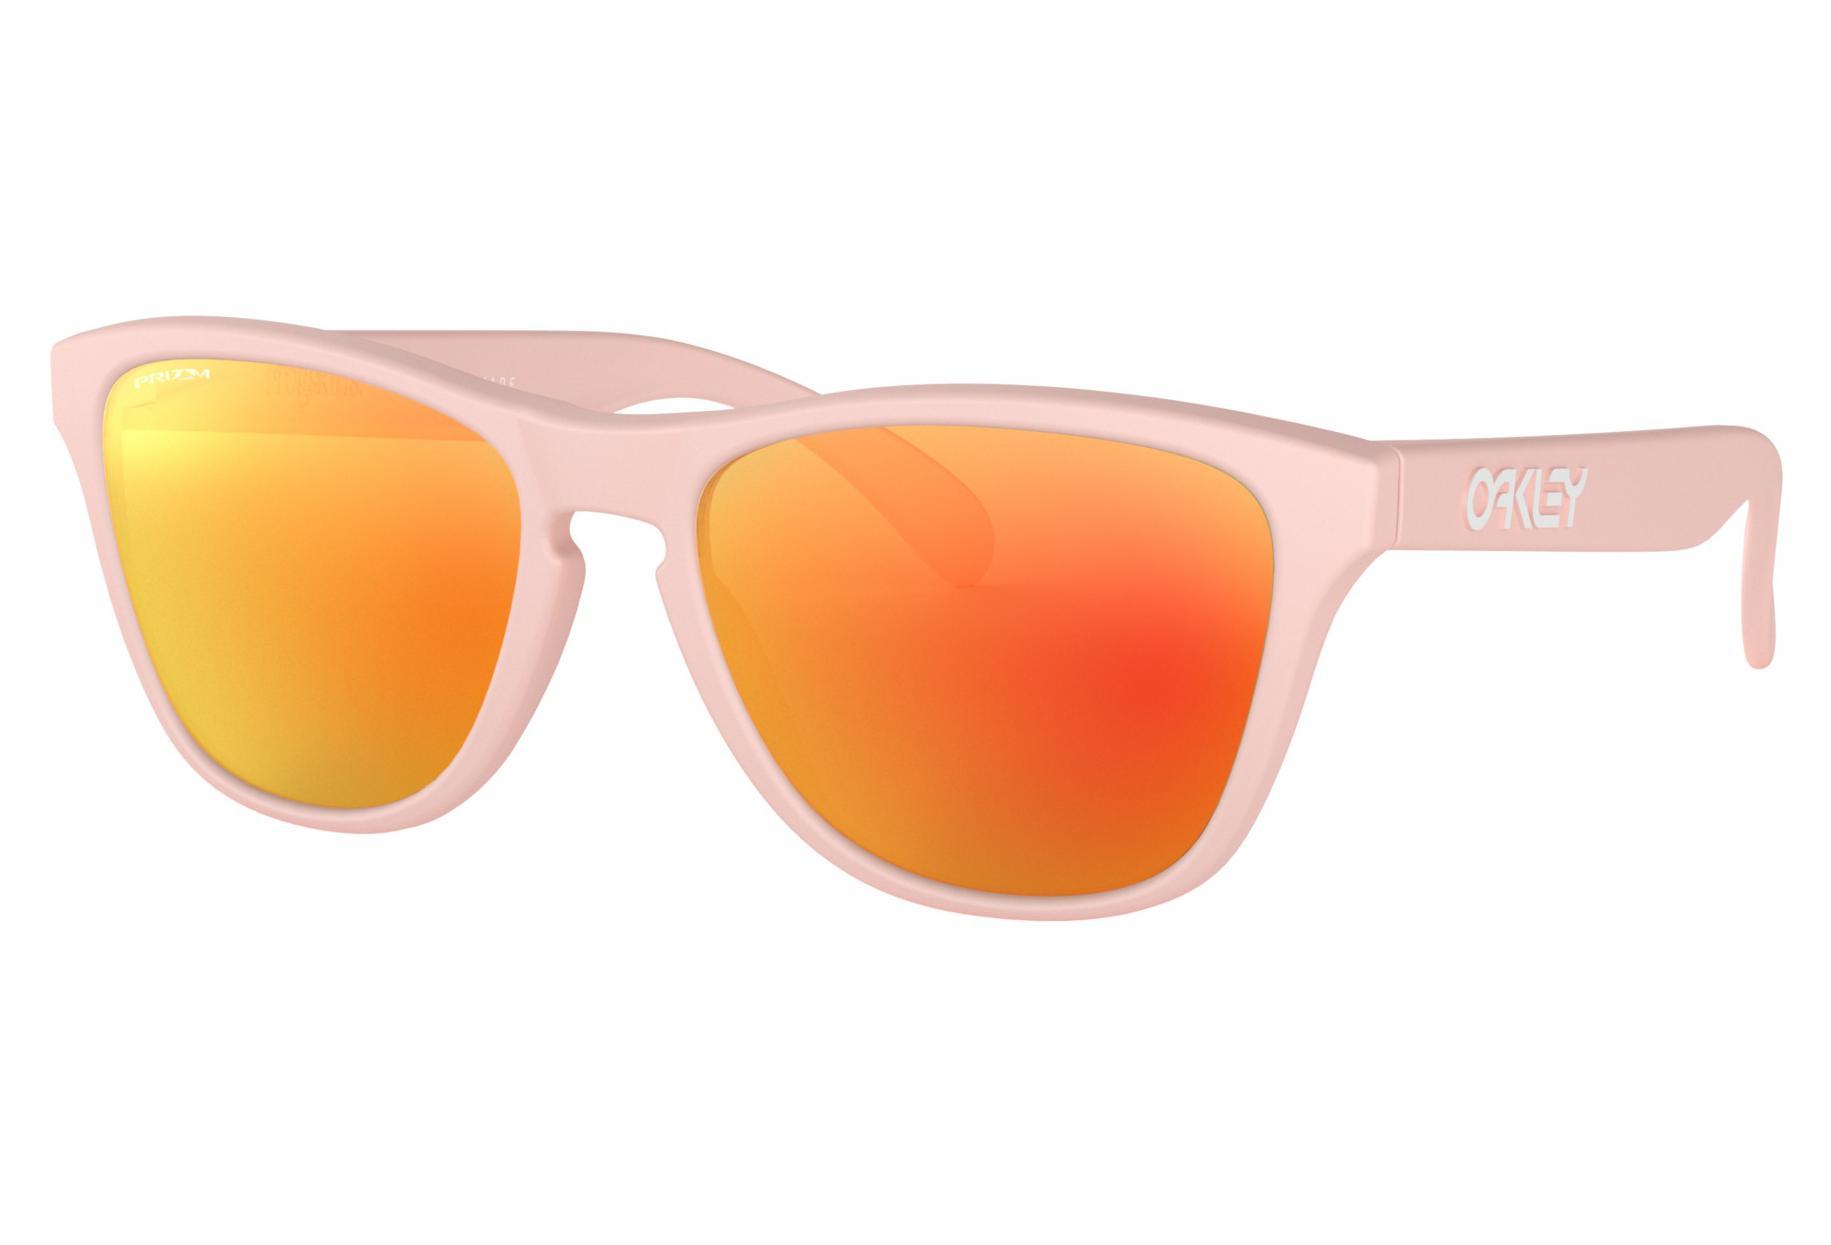 b878eae6bd2 Oakley Sunglasses Frogskins XS Youth Matte Pink   Prizm Ruby   Ref. OJ9006-0253